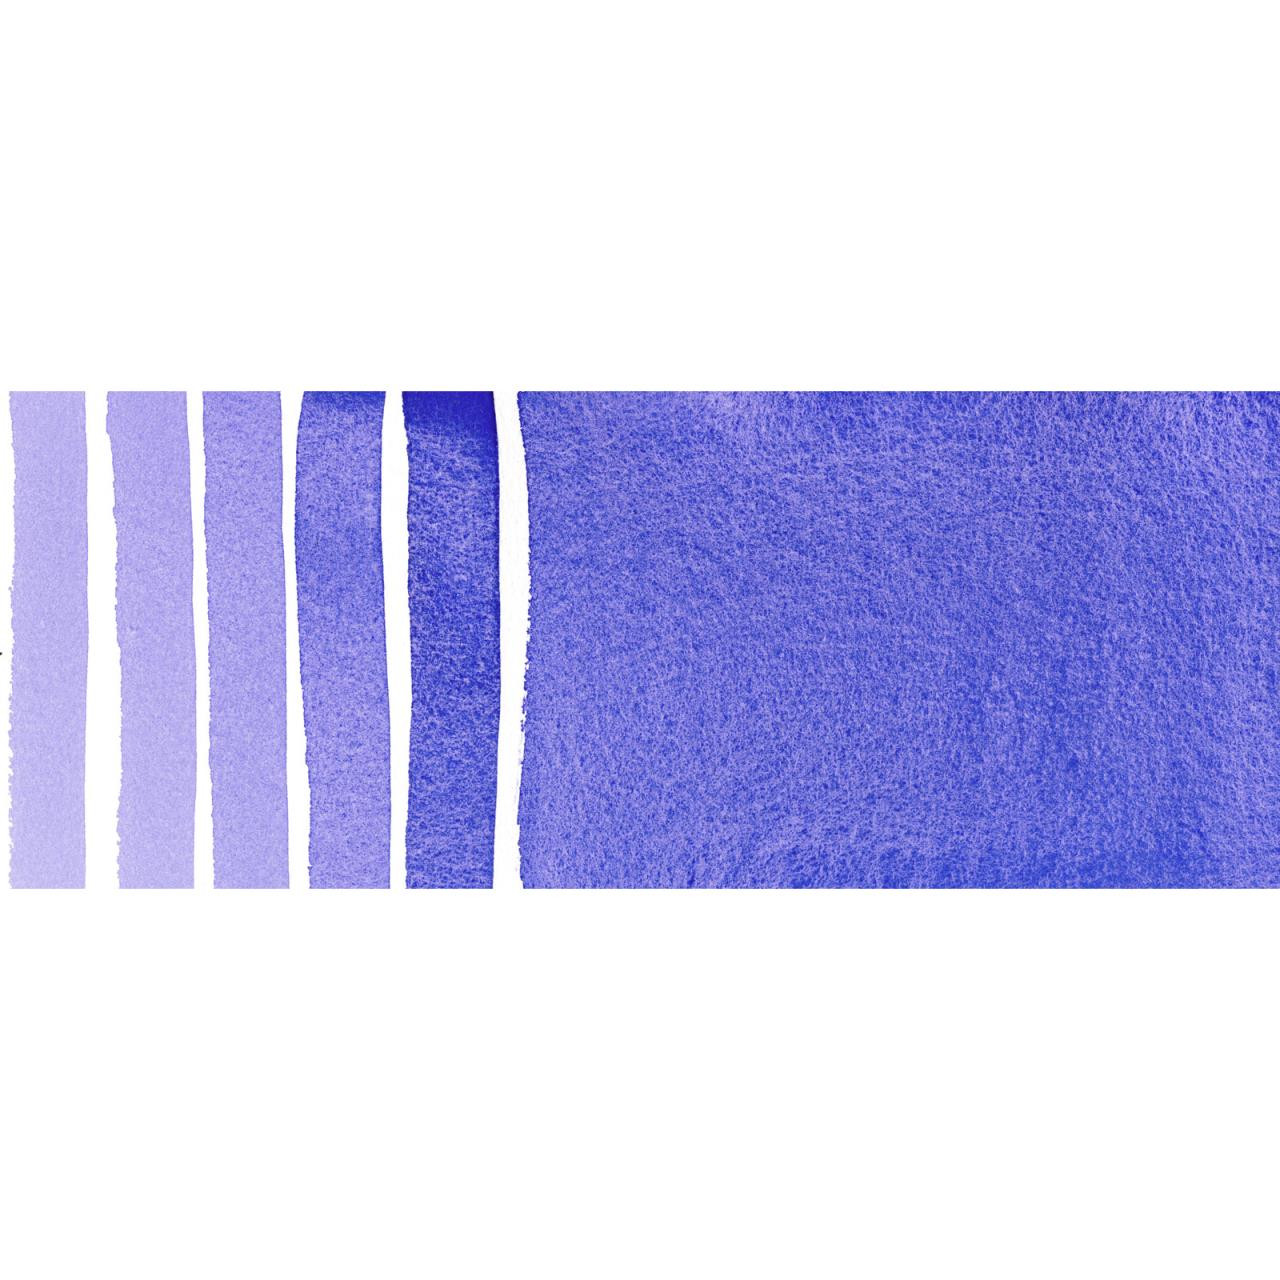 Ultramarine Blue, DANIEL SMITH Extra Fine Watercolors 5ml Tubes -